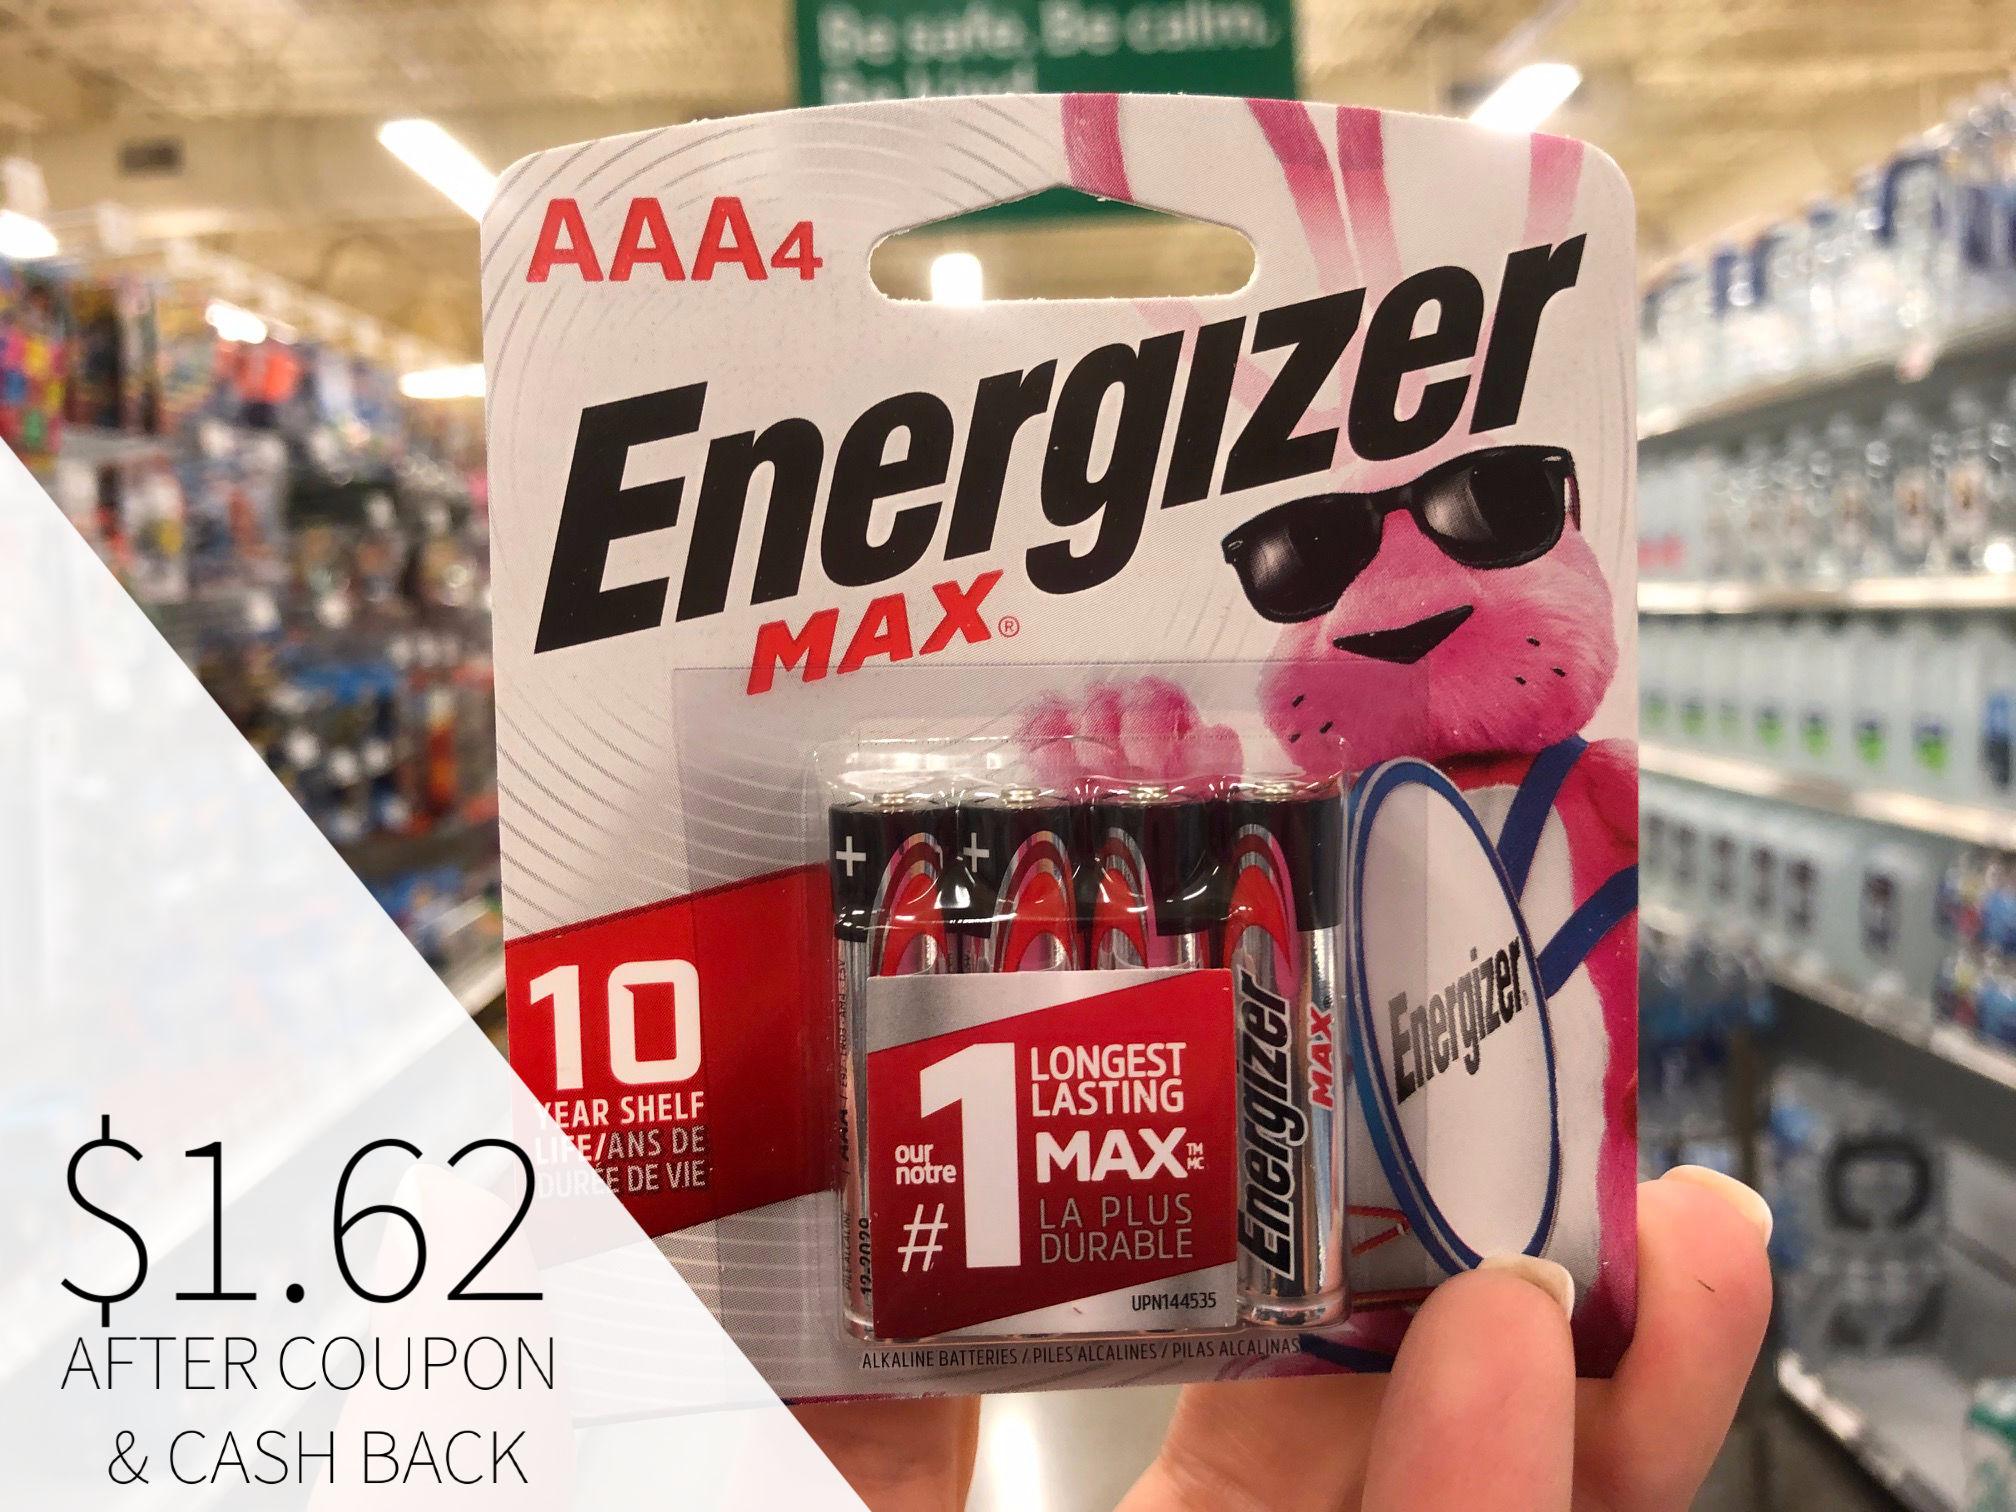 Energizer Batteries As Low As $2.62 At Publix on I Heart Publix 1